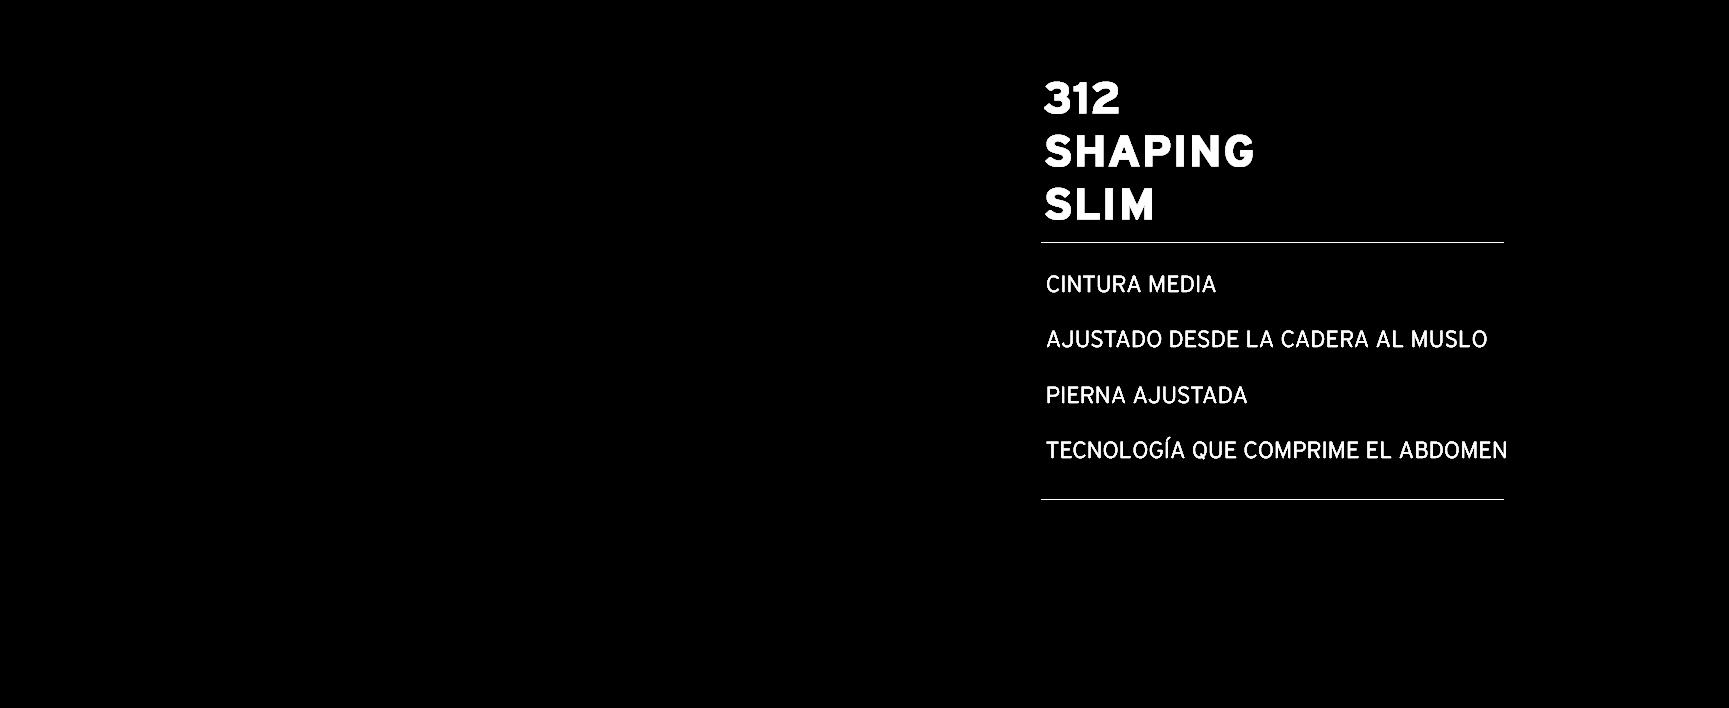 312 shaping slim